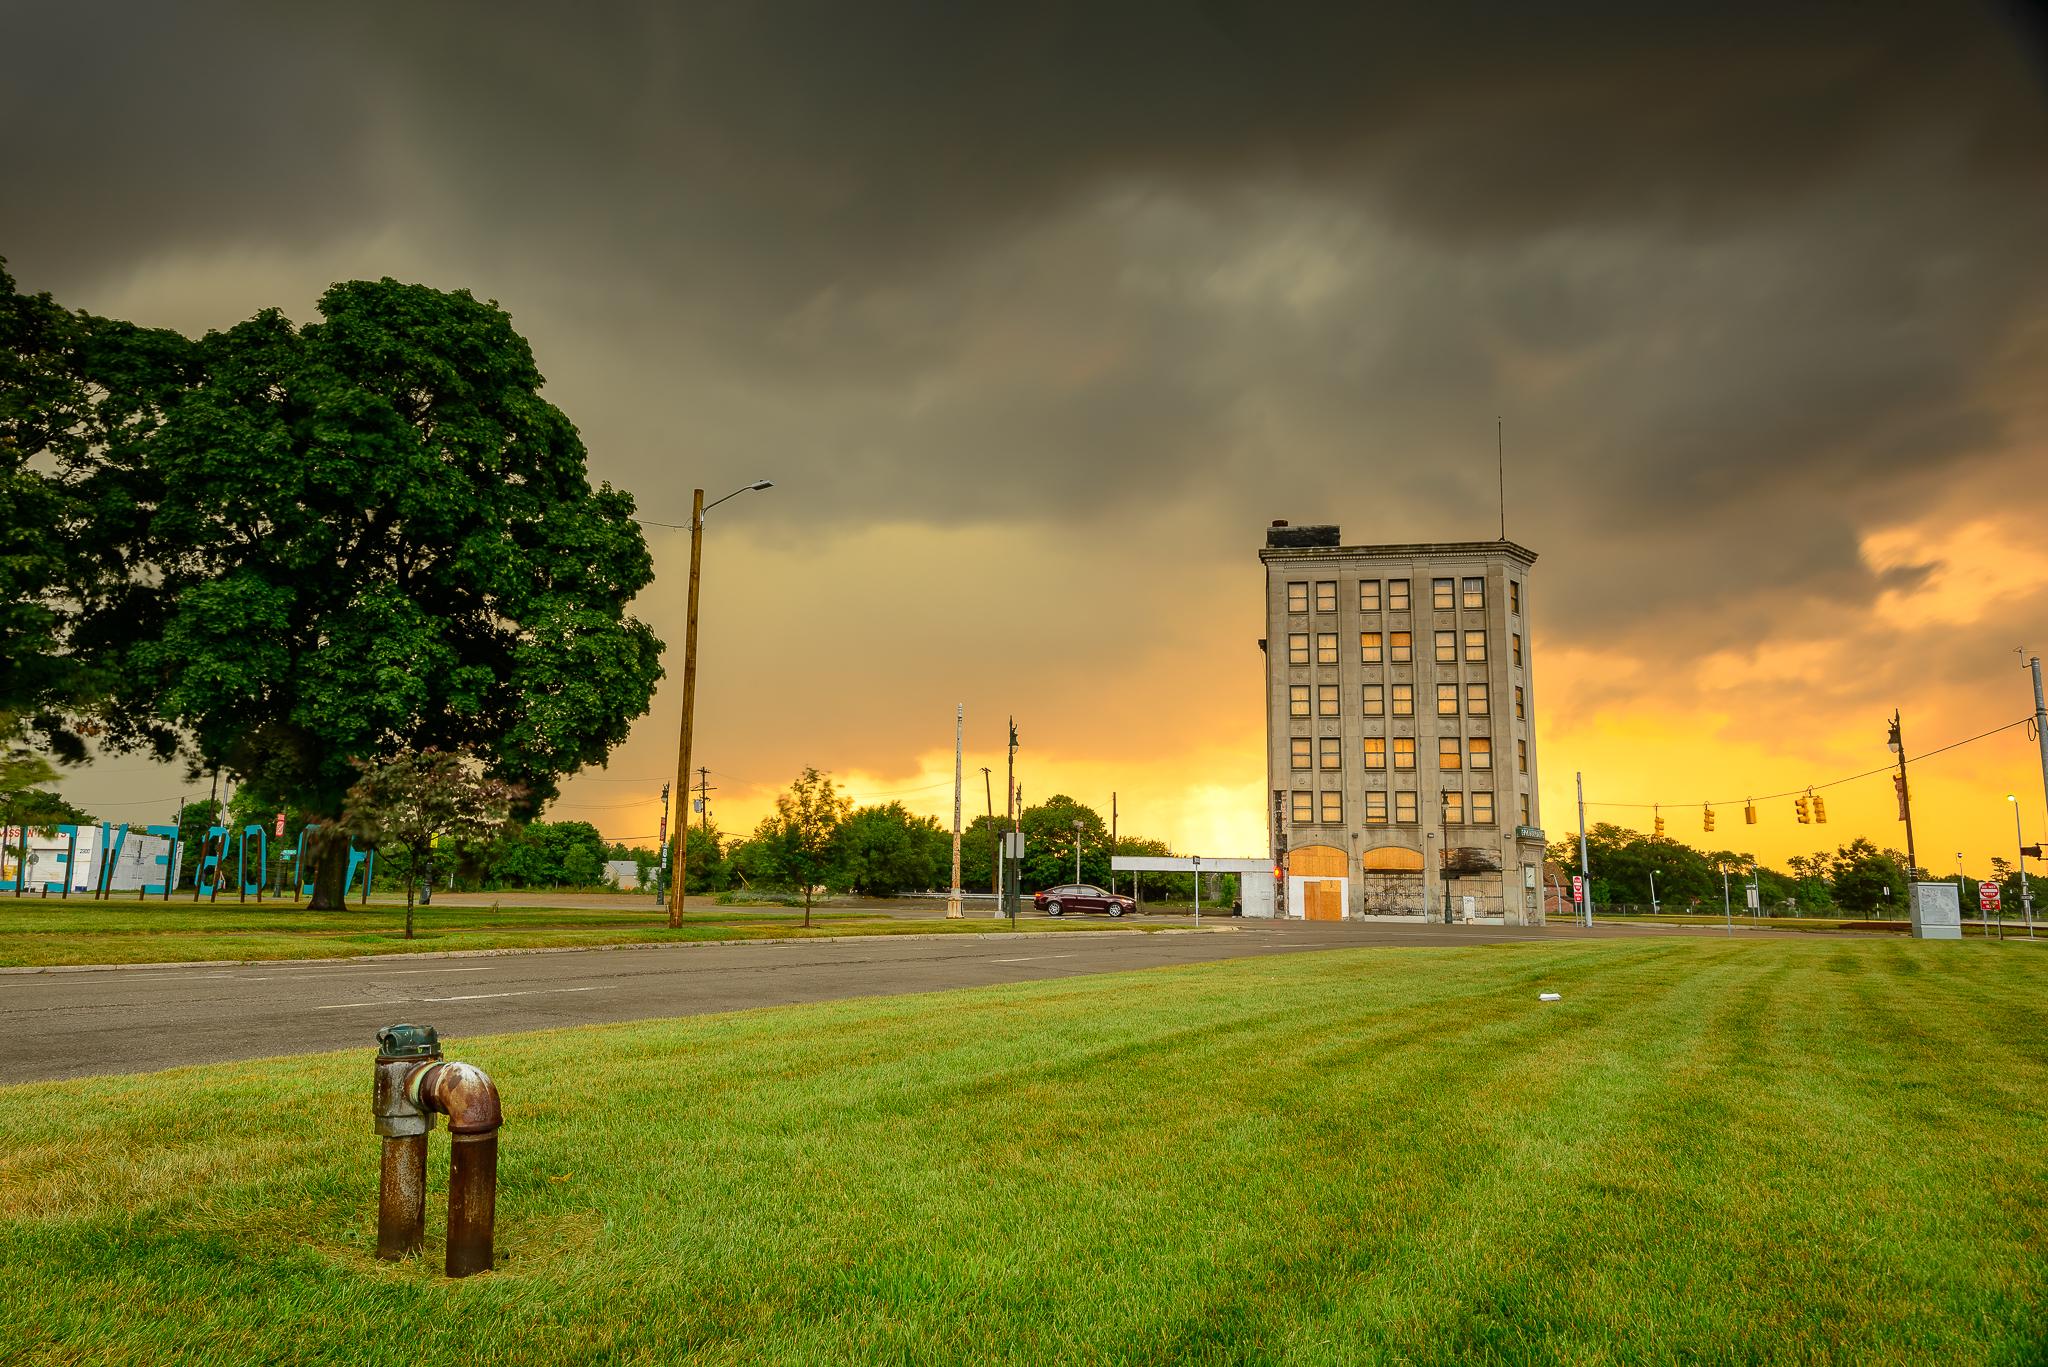 7/25/15. A proper return to Detroit. Roosevelt Park, just blocks from home.